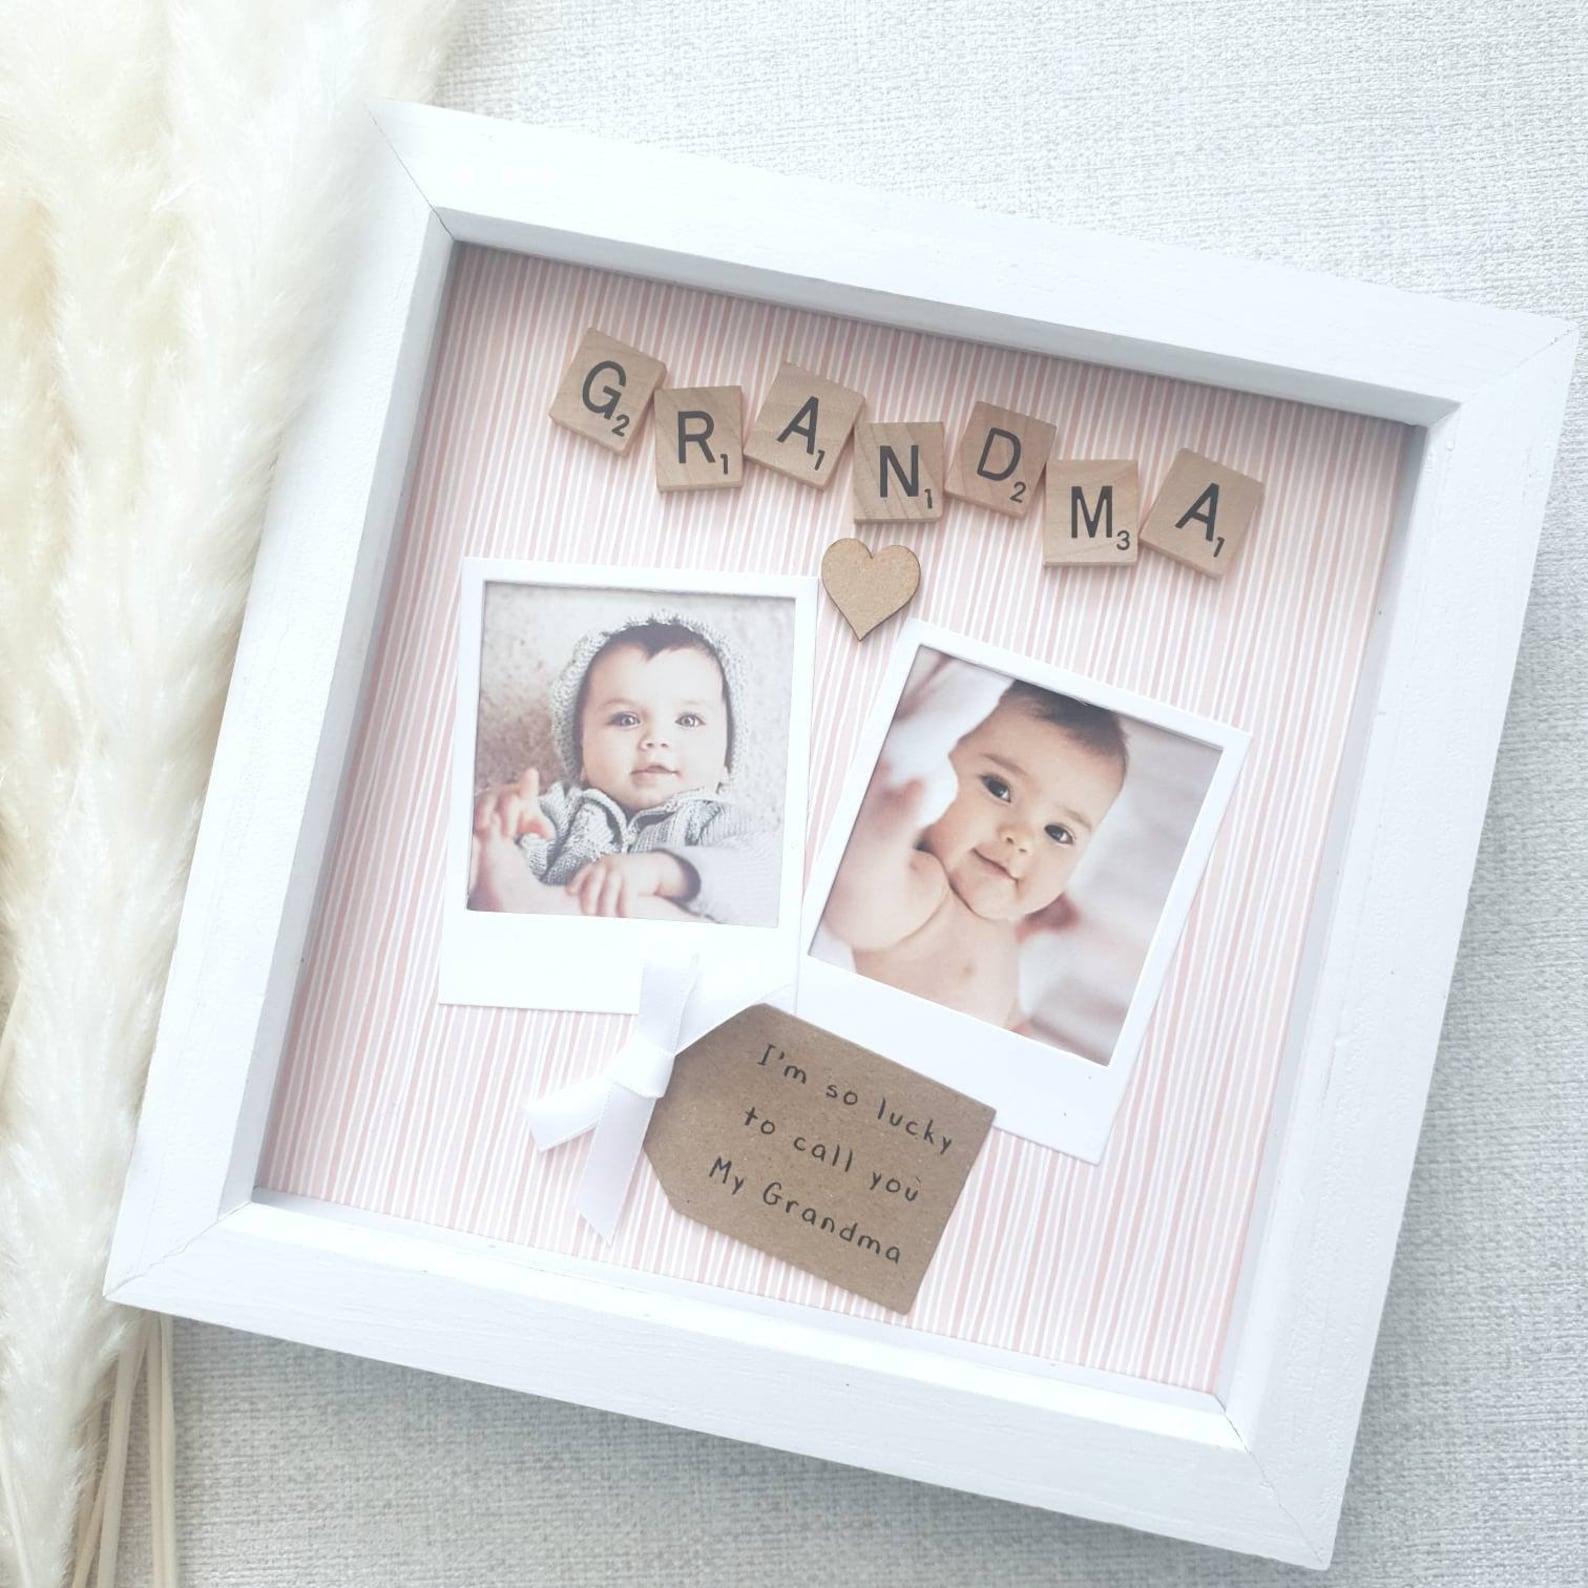 Personalised Grandma Frame